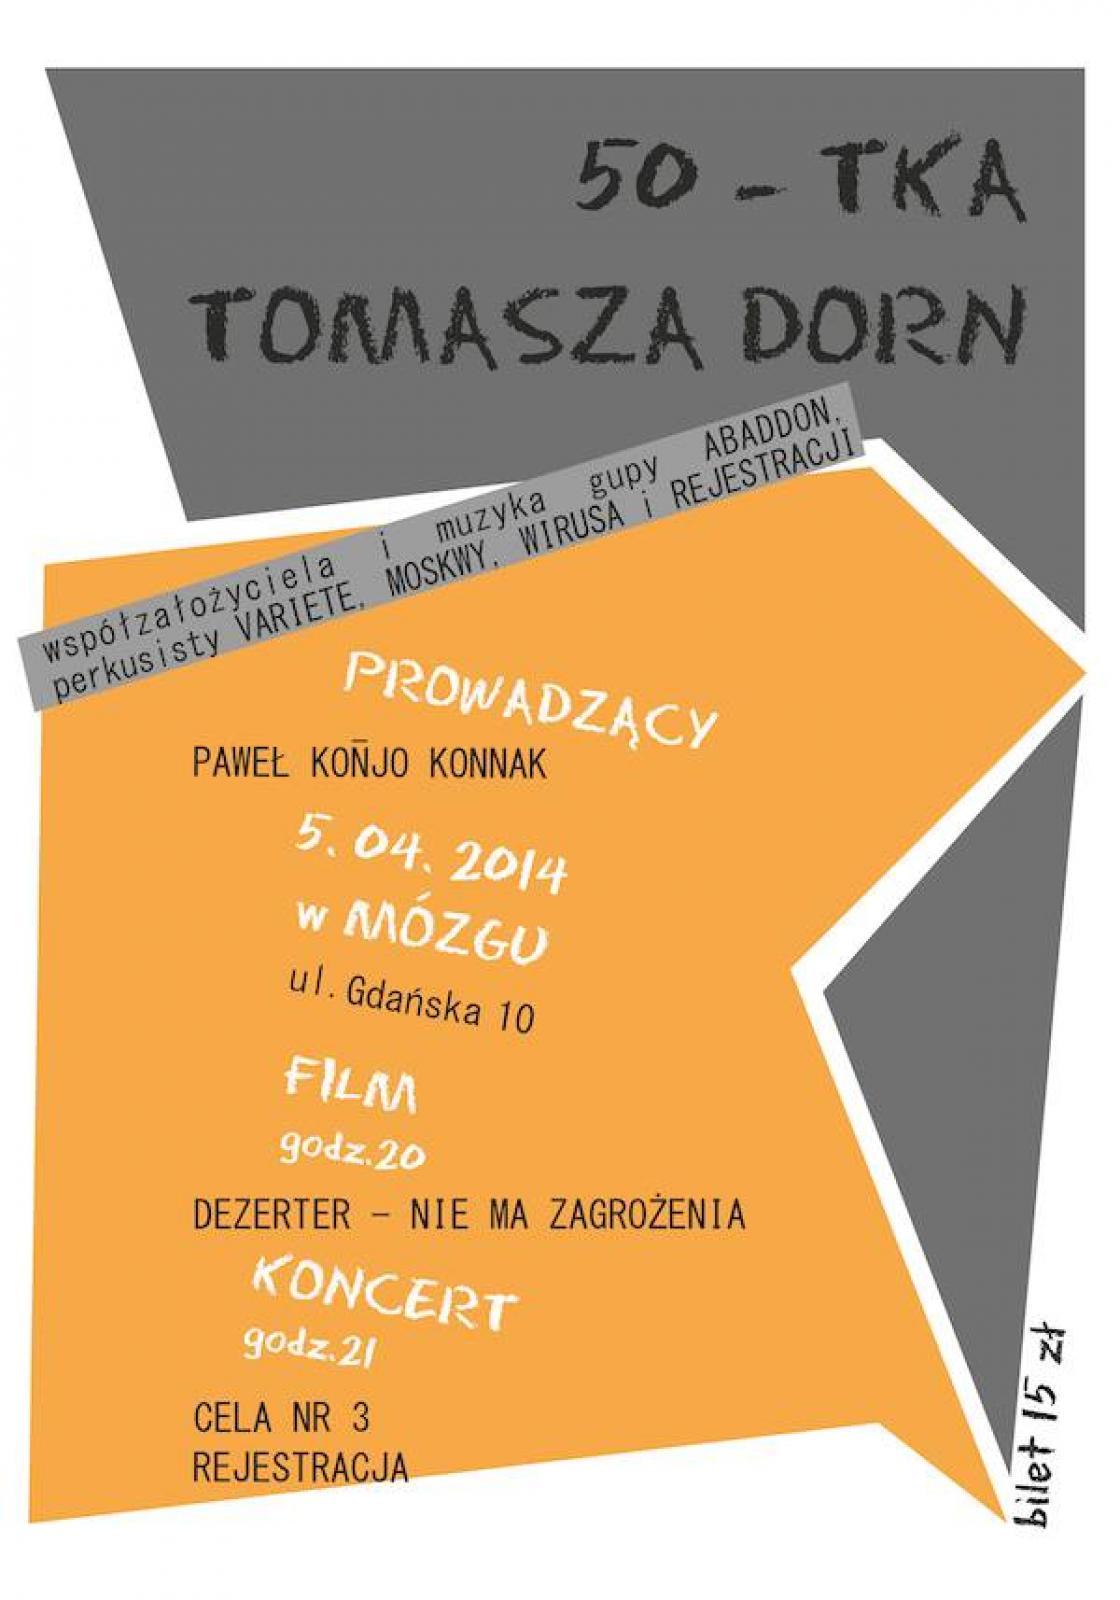 50tka TOMASZA DORN - seria koncertów/projekcja